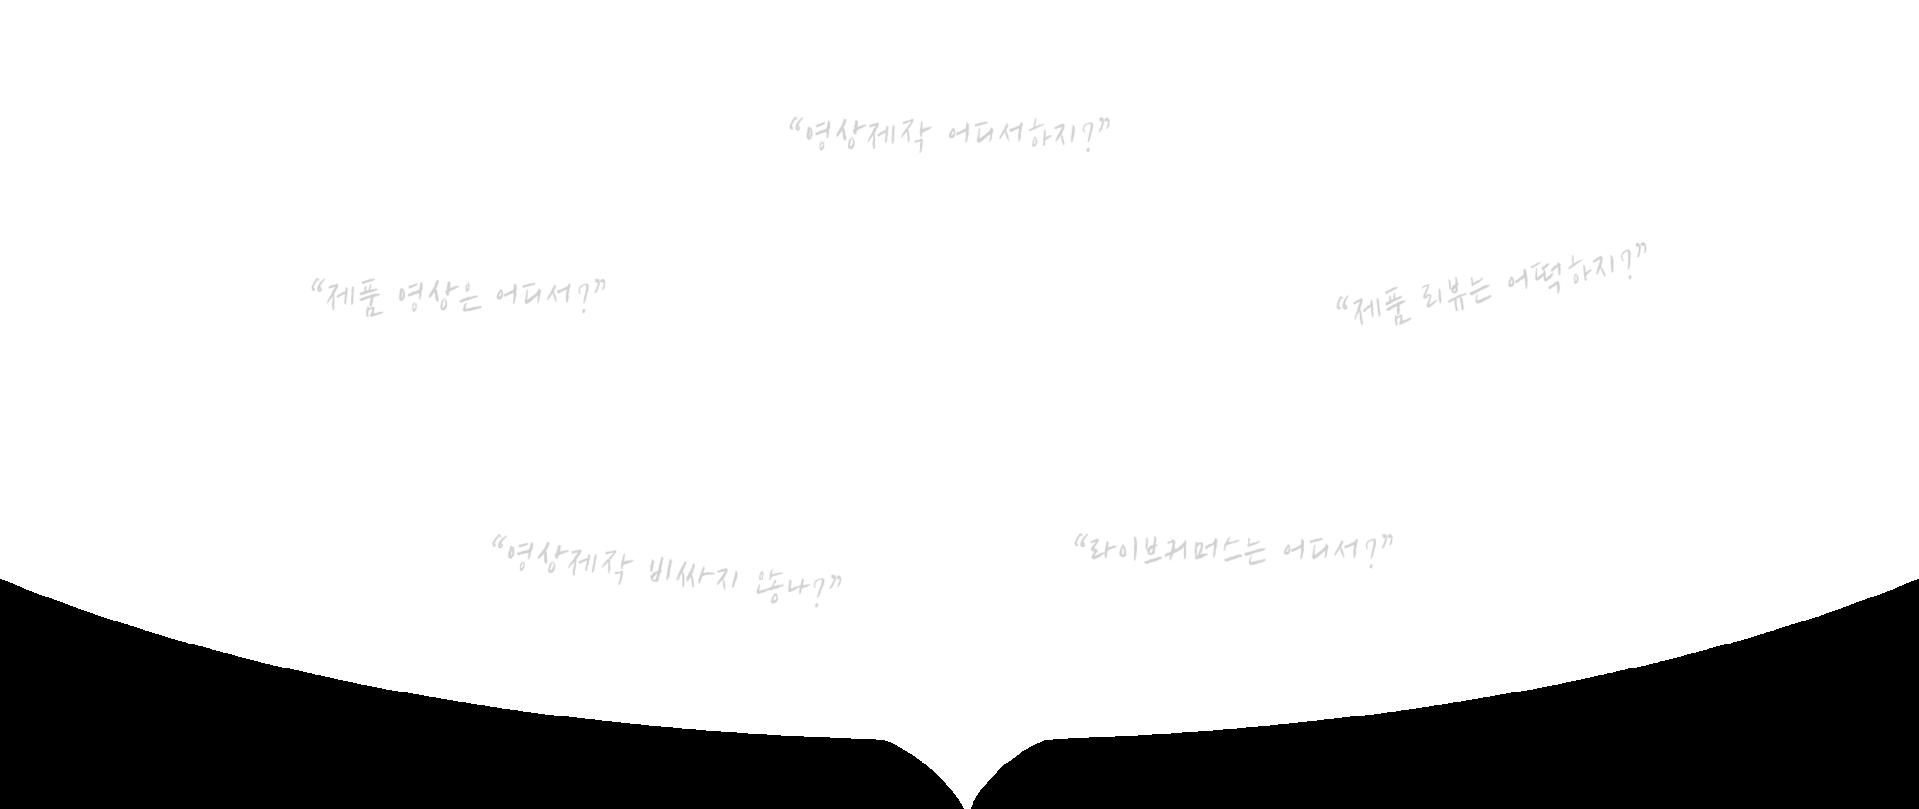 "<p style=""margin-top:11%; line-height:1.5em; font-weight:bold;"">실 매출에 도움이 되는<br>온라인 마케팅은?</p>"